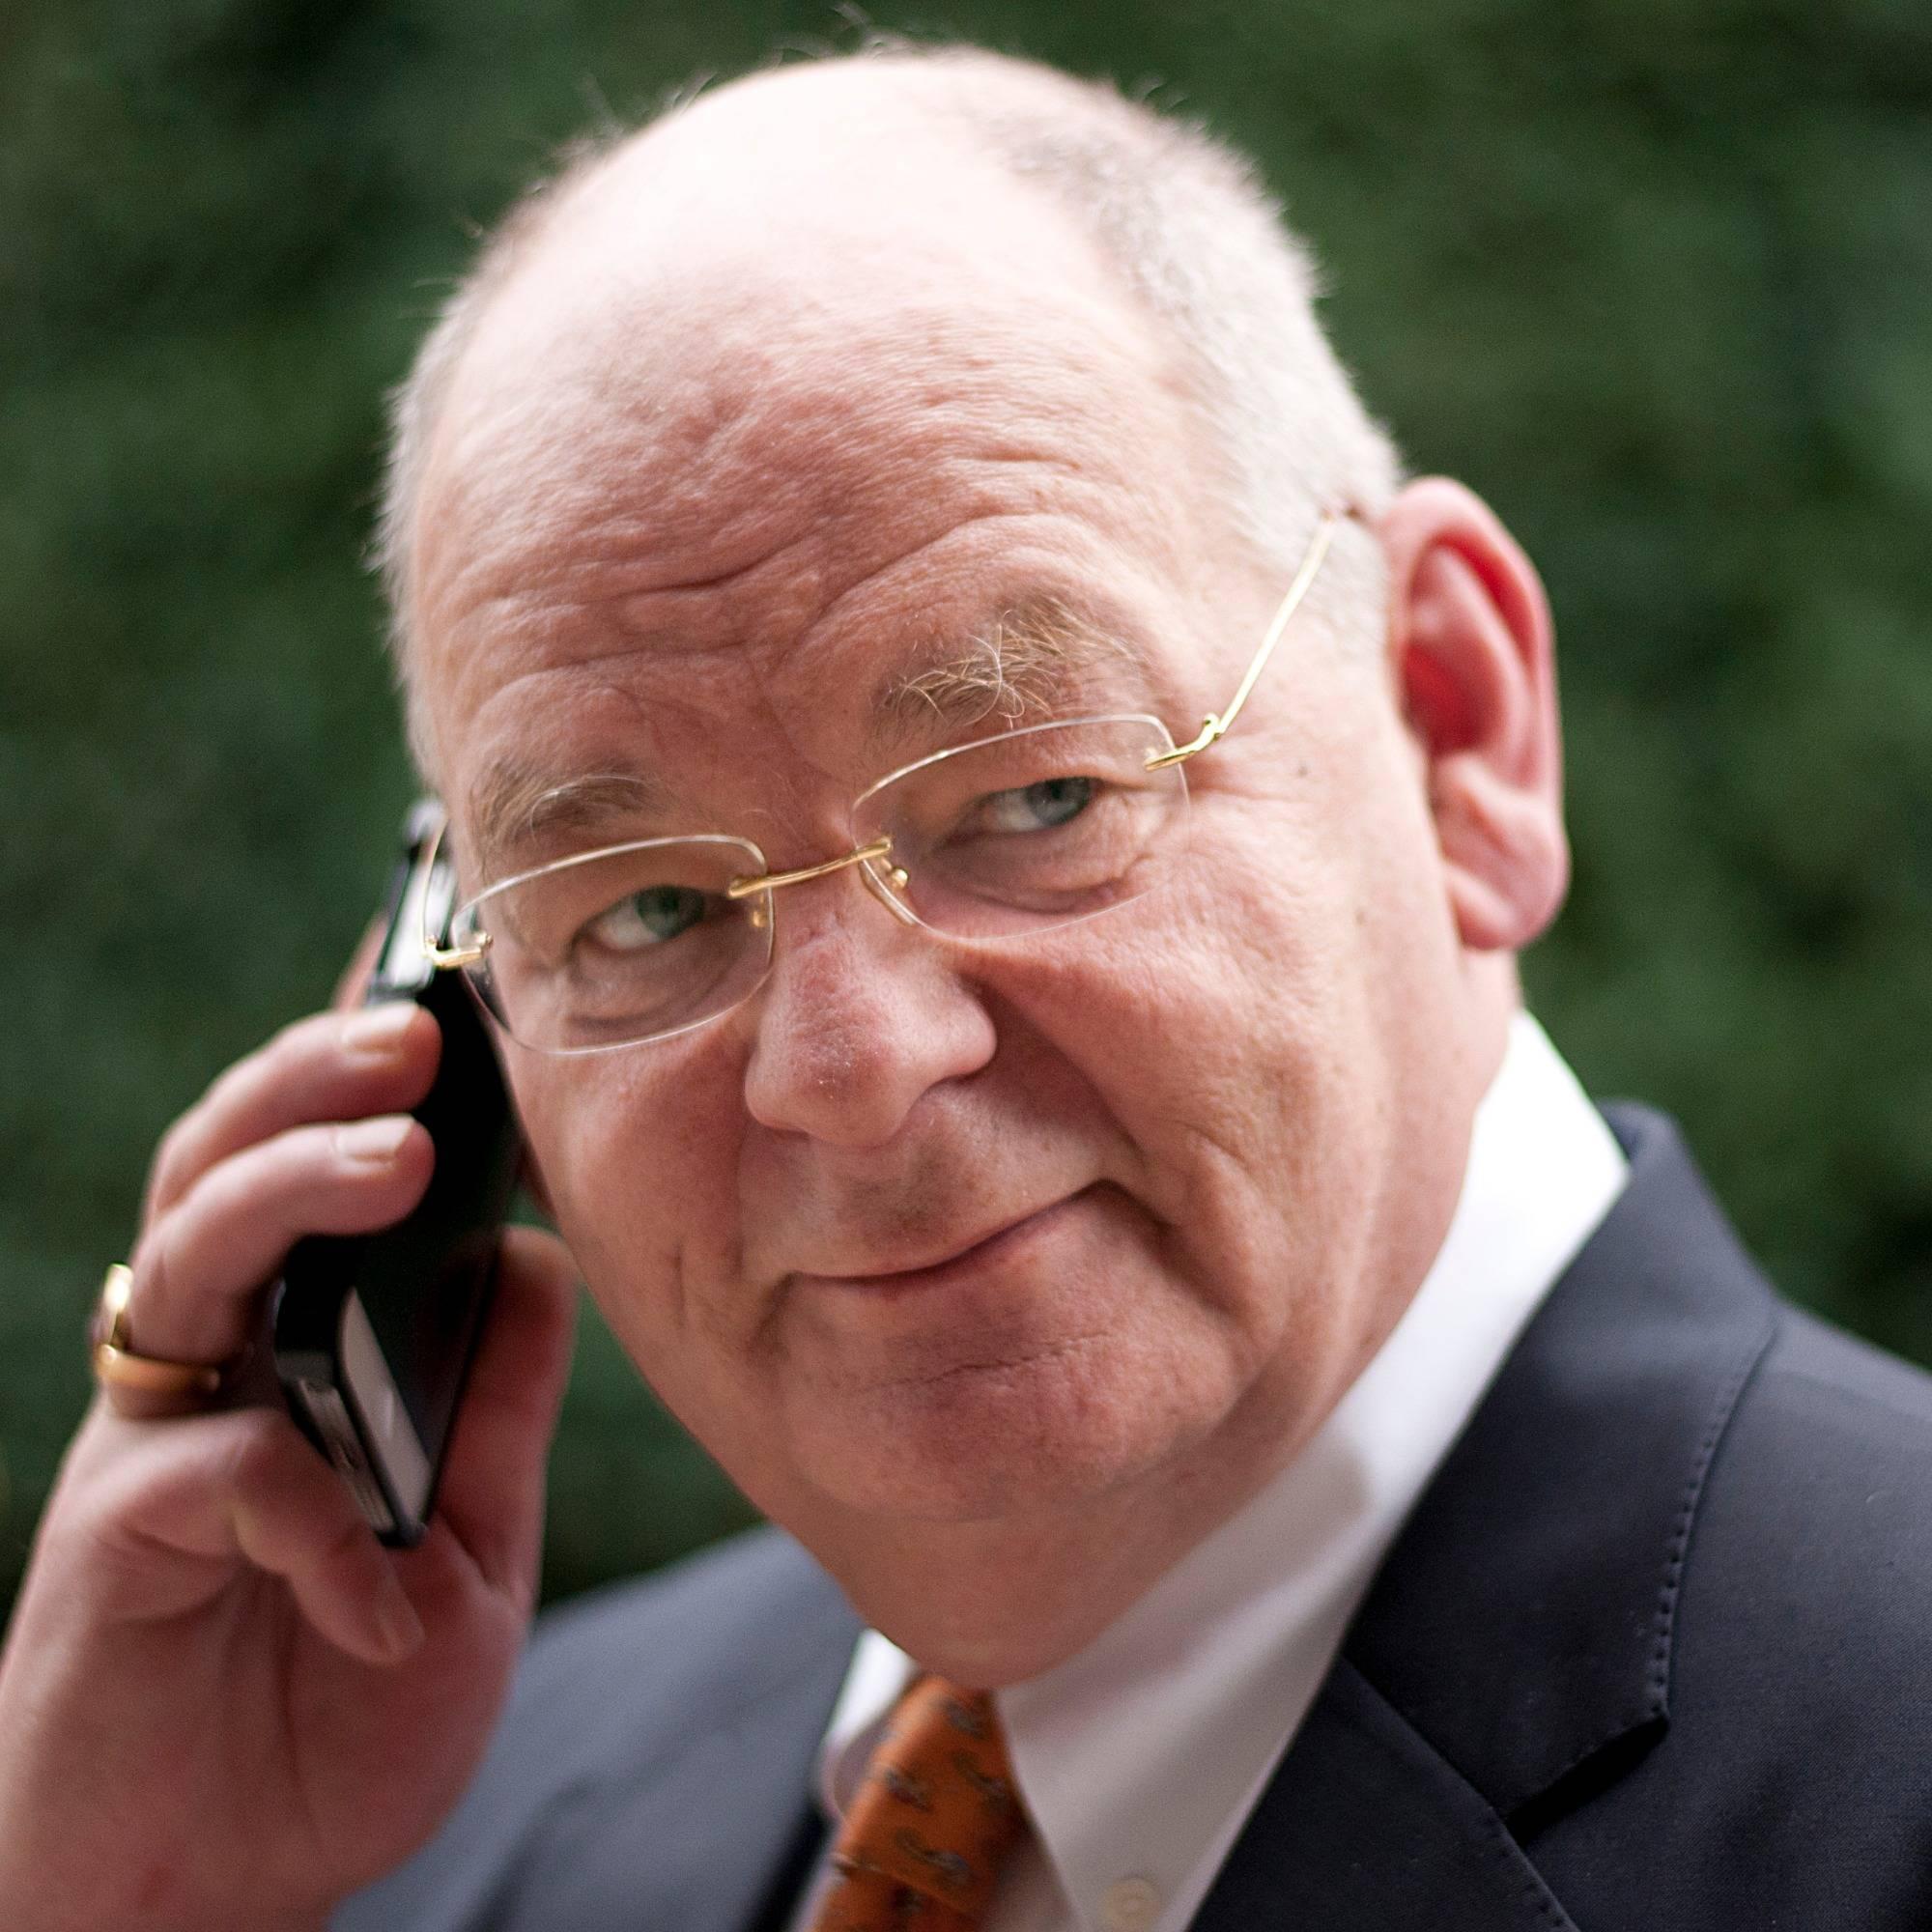 Peter Landsiedel